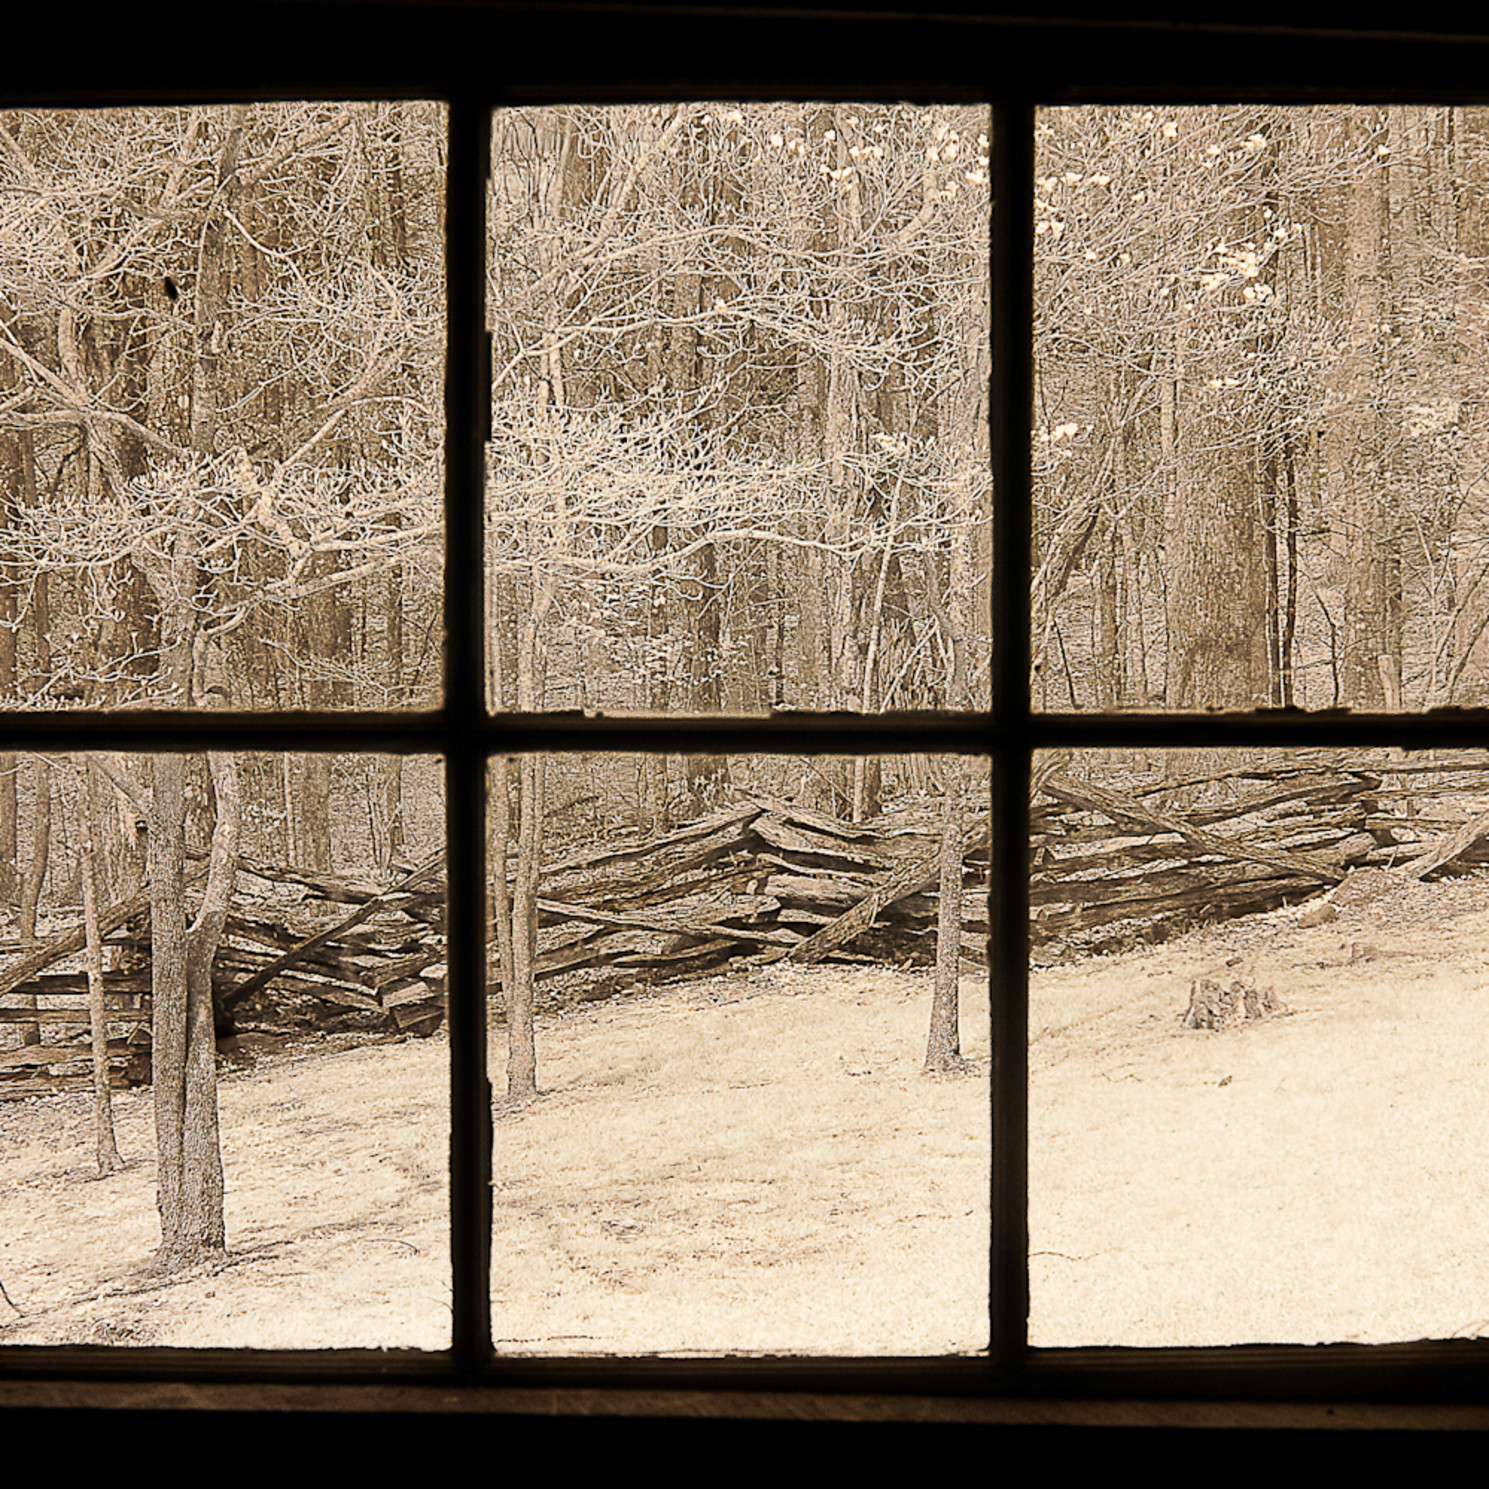 Window view tennessee 1 tychrz